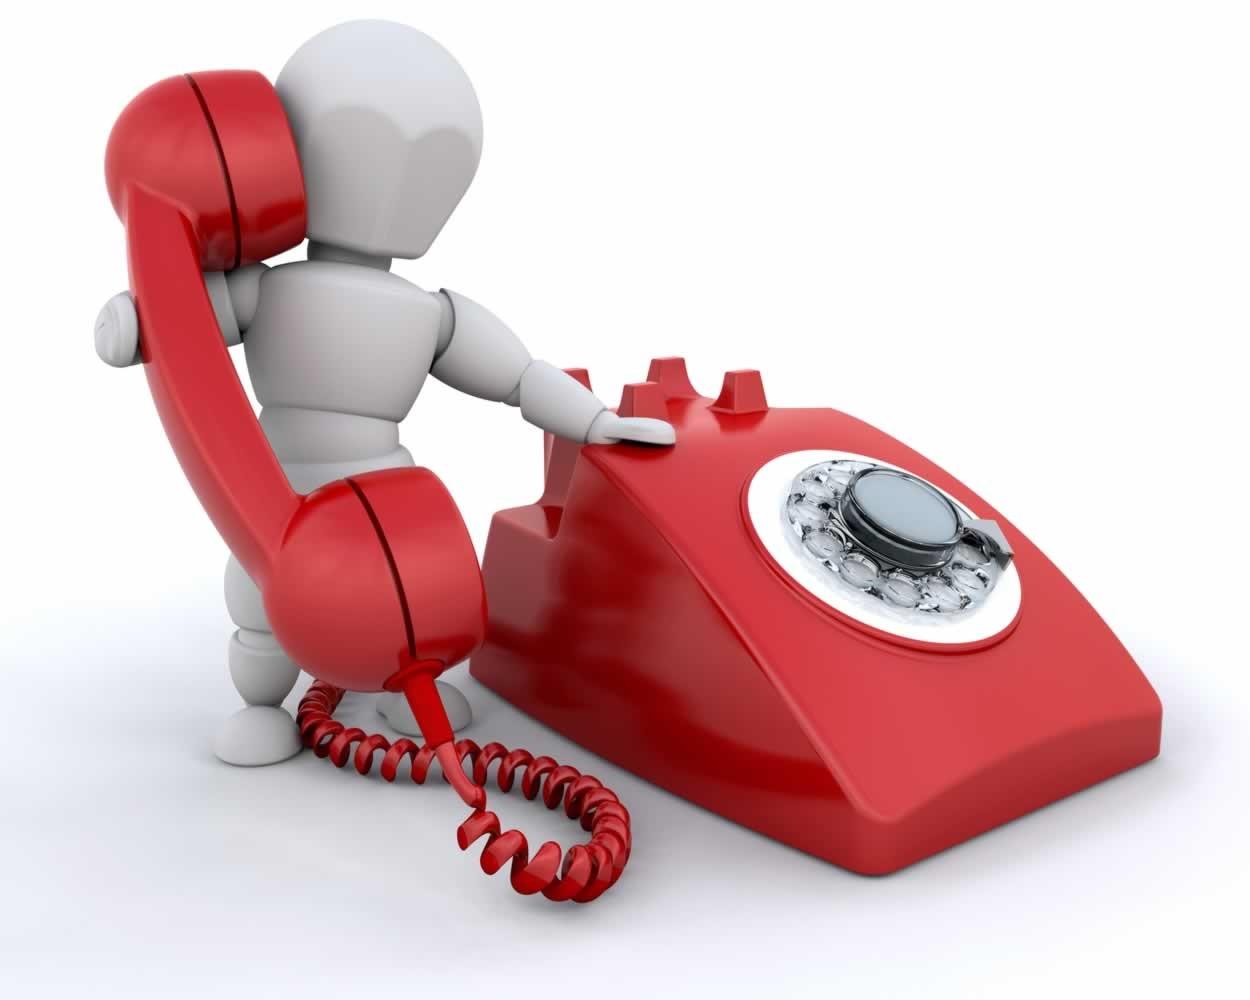 آشنایی با آداب تماس تلفنی با اورژانس